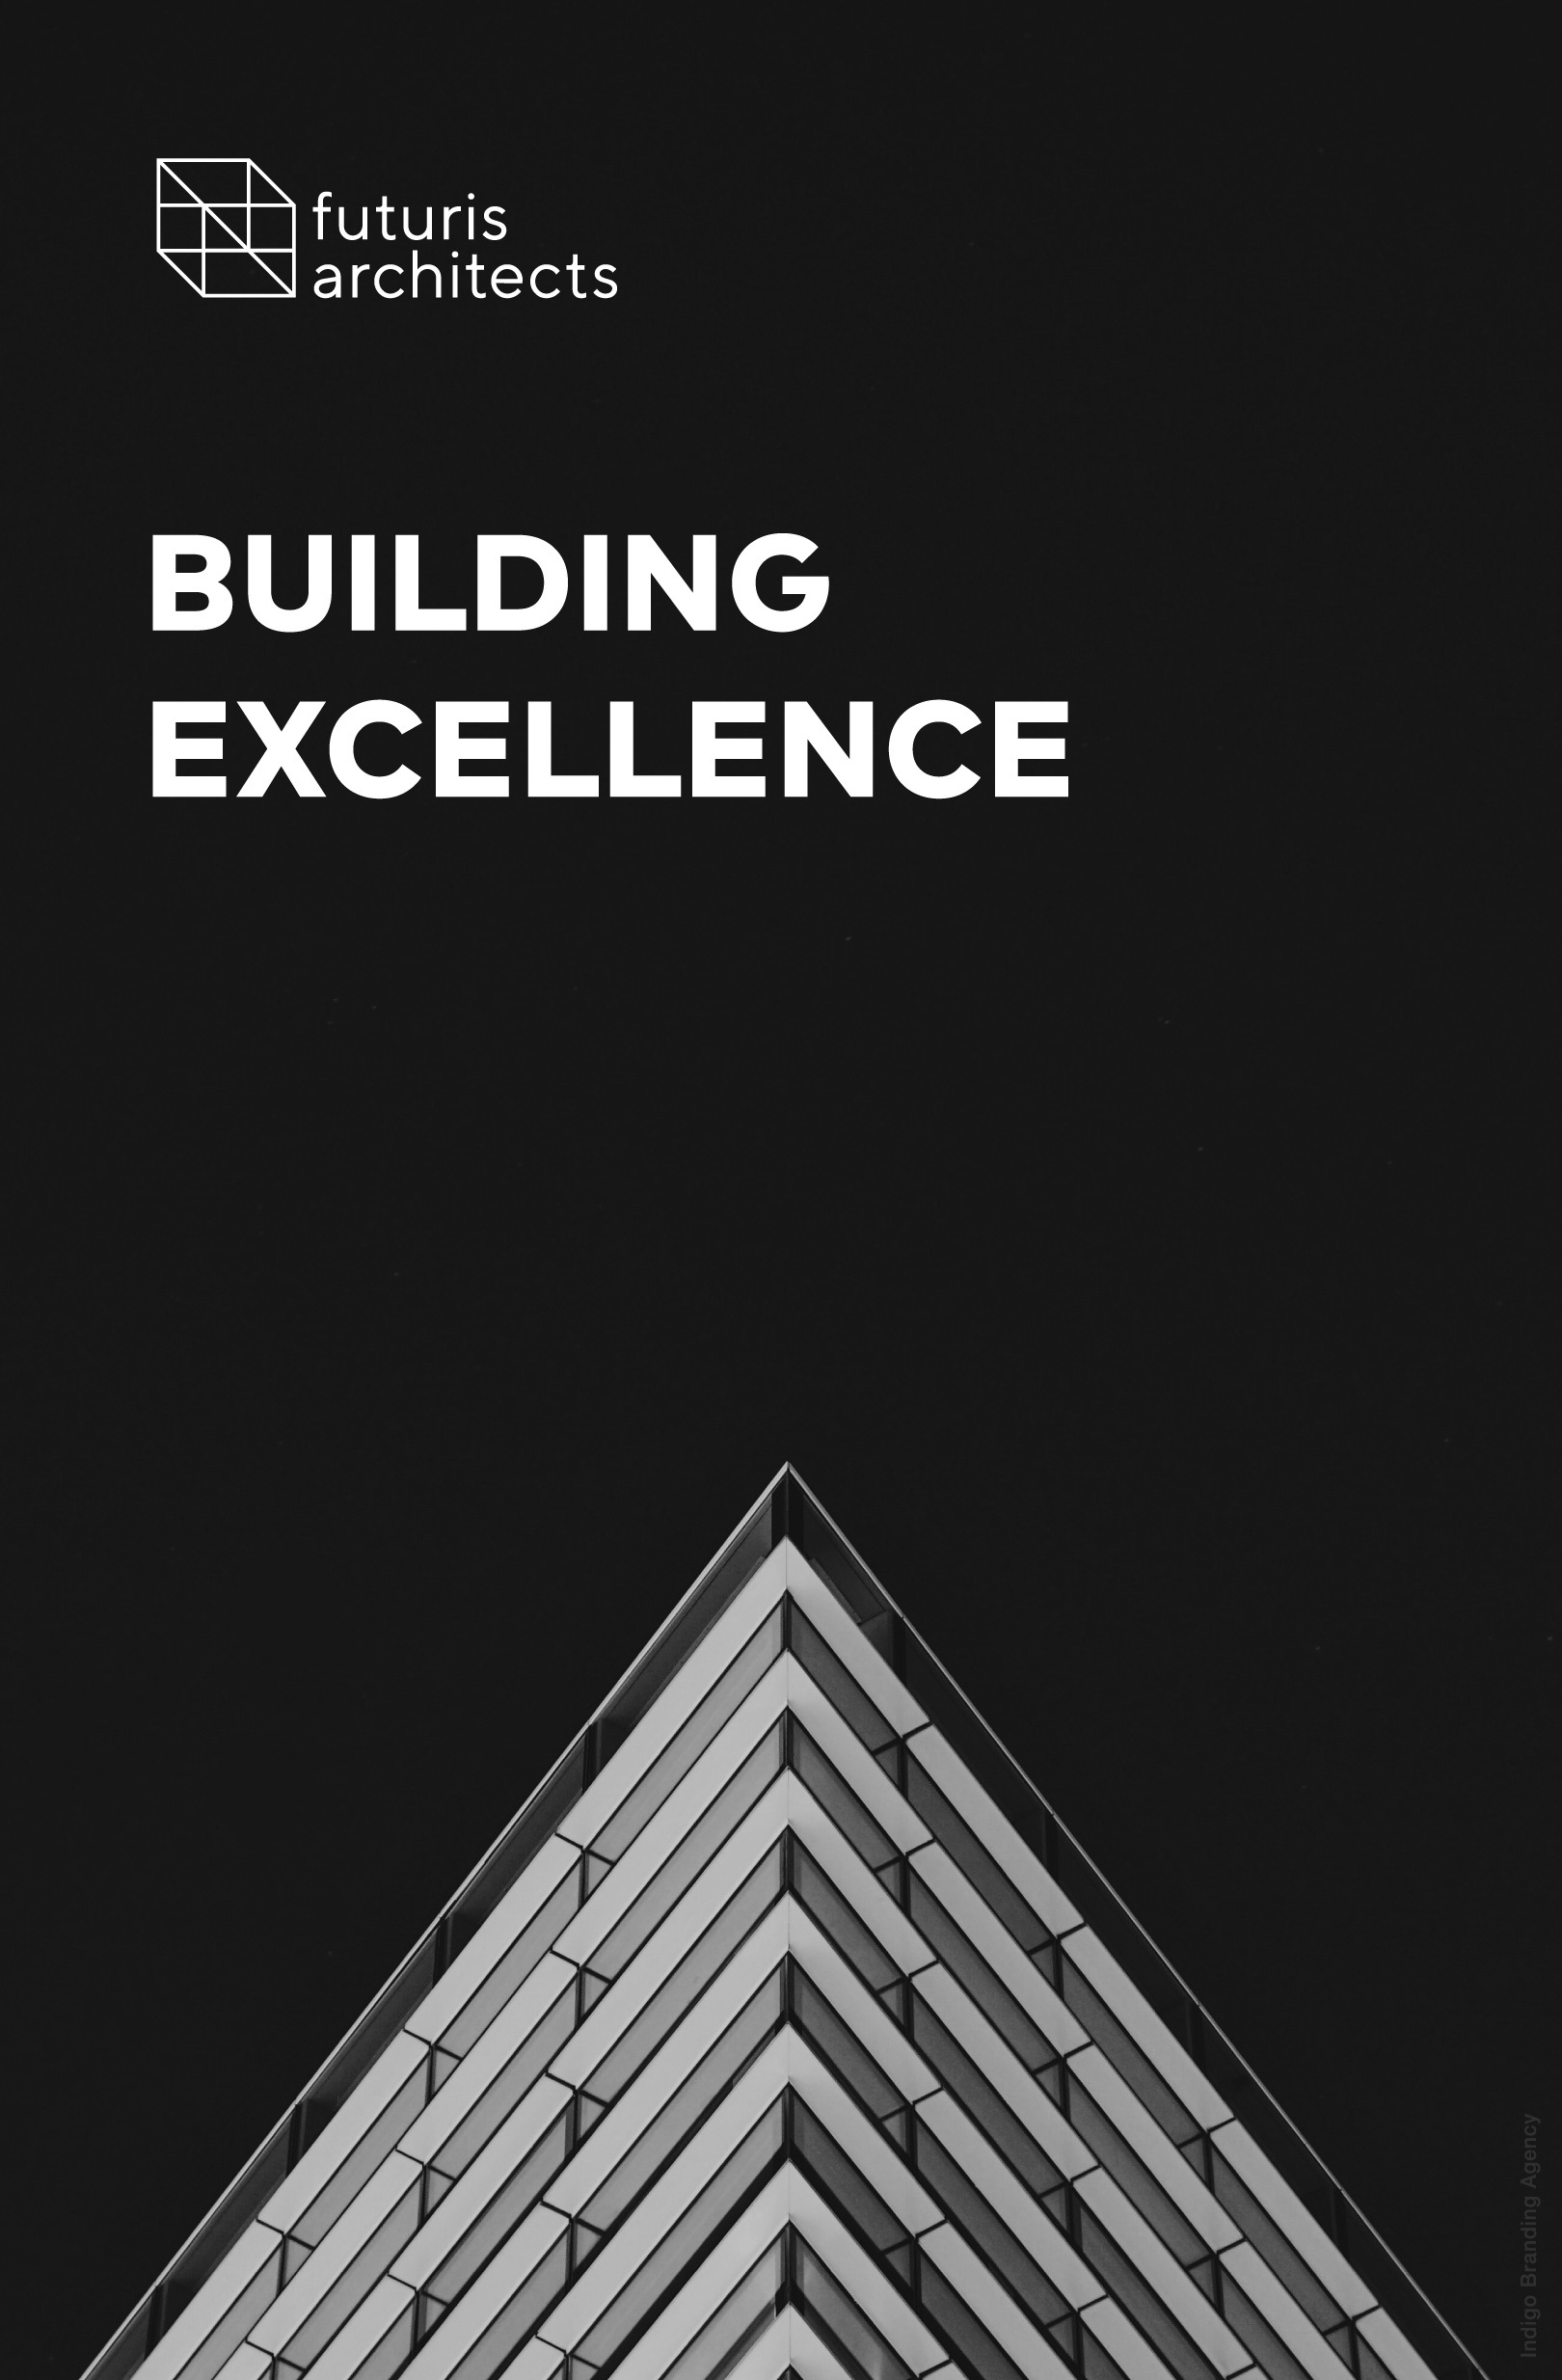 building design architectural branding mockup futuris architects interior design